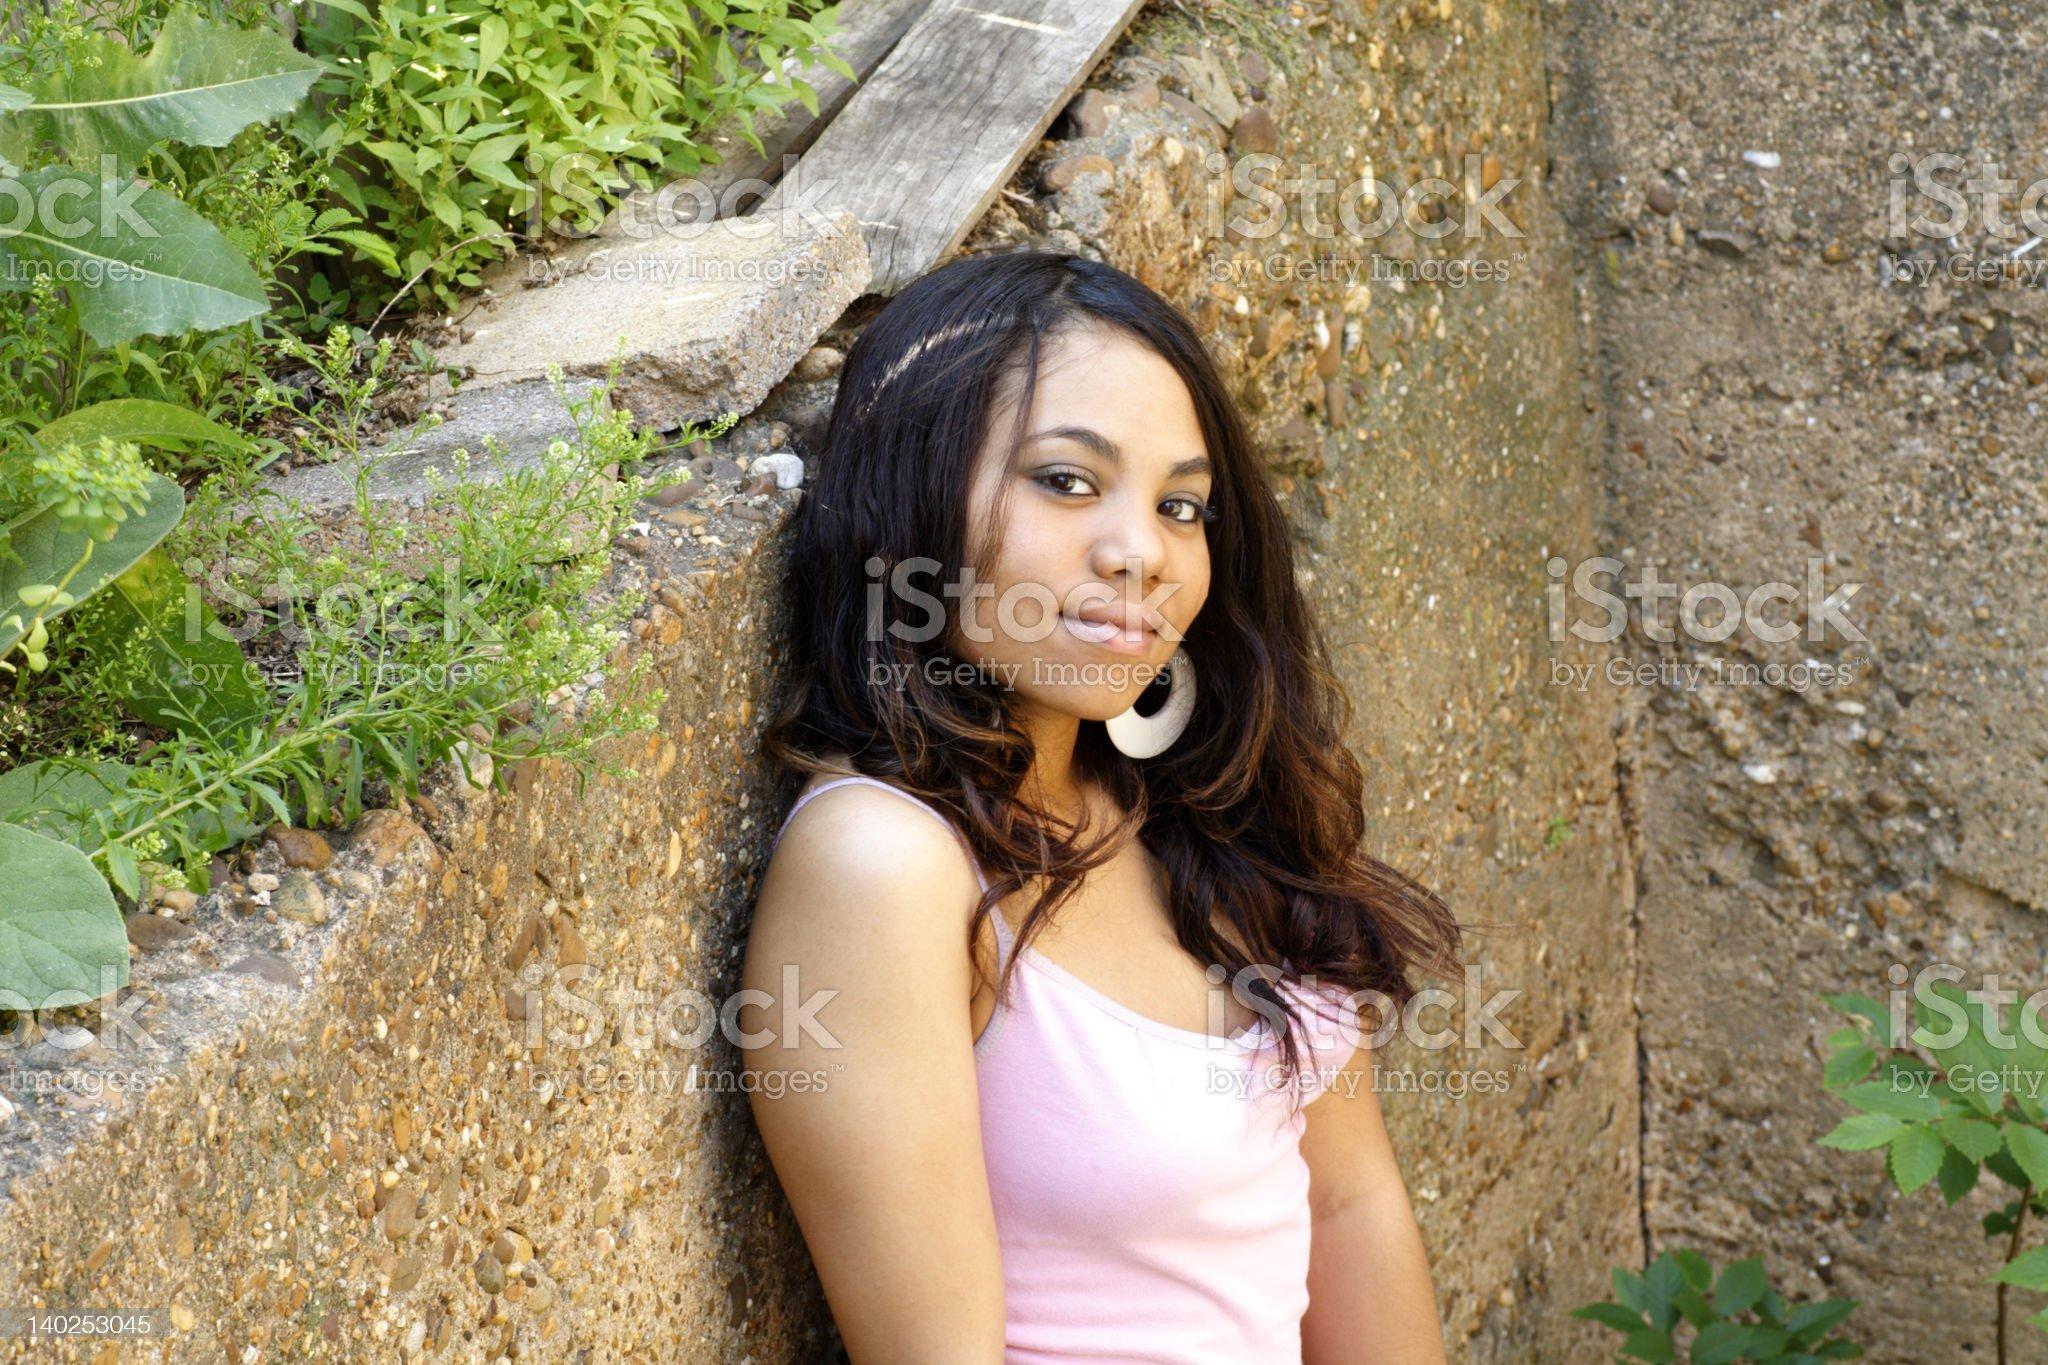 Flirtation royalty-free stock photo